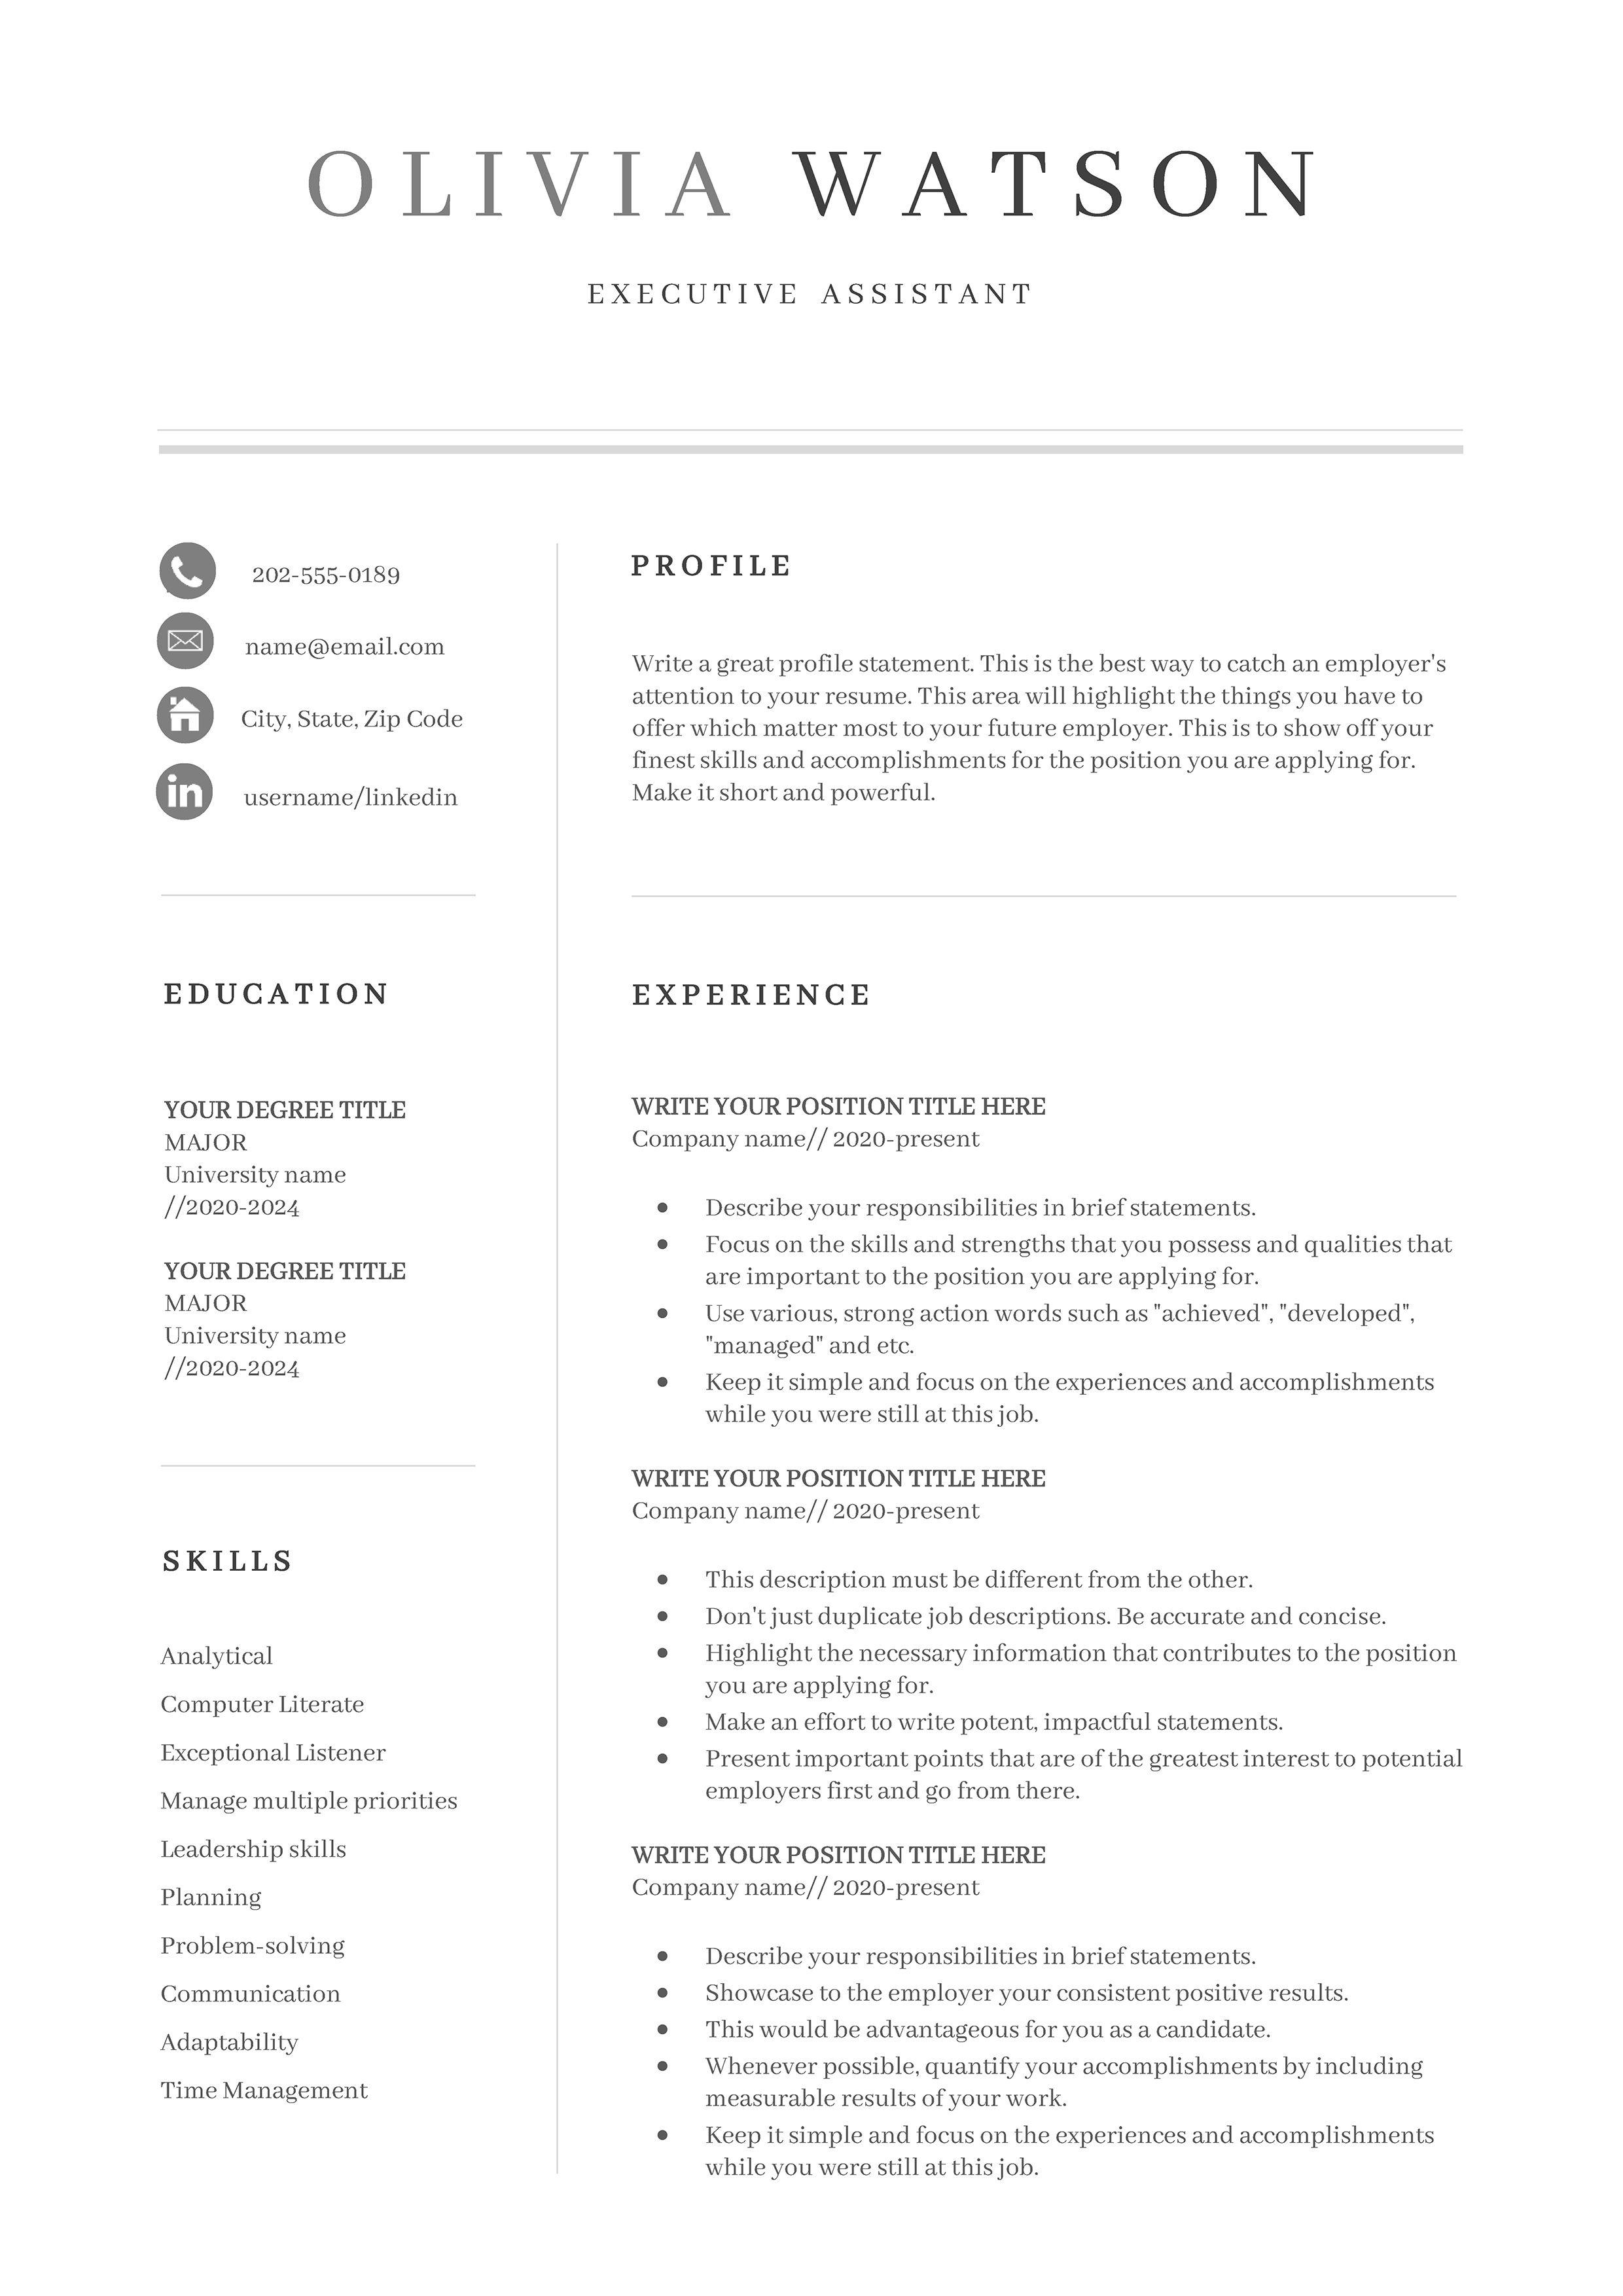 Resume Template Professional Resume Template Resume Etsy Resume Template Professional Resume Template Resume